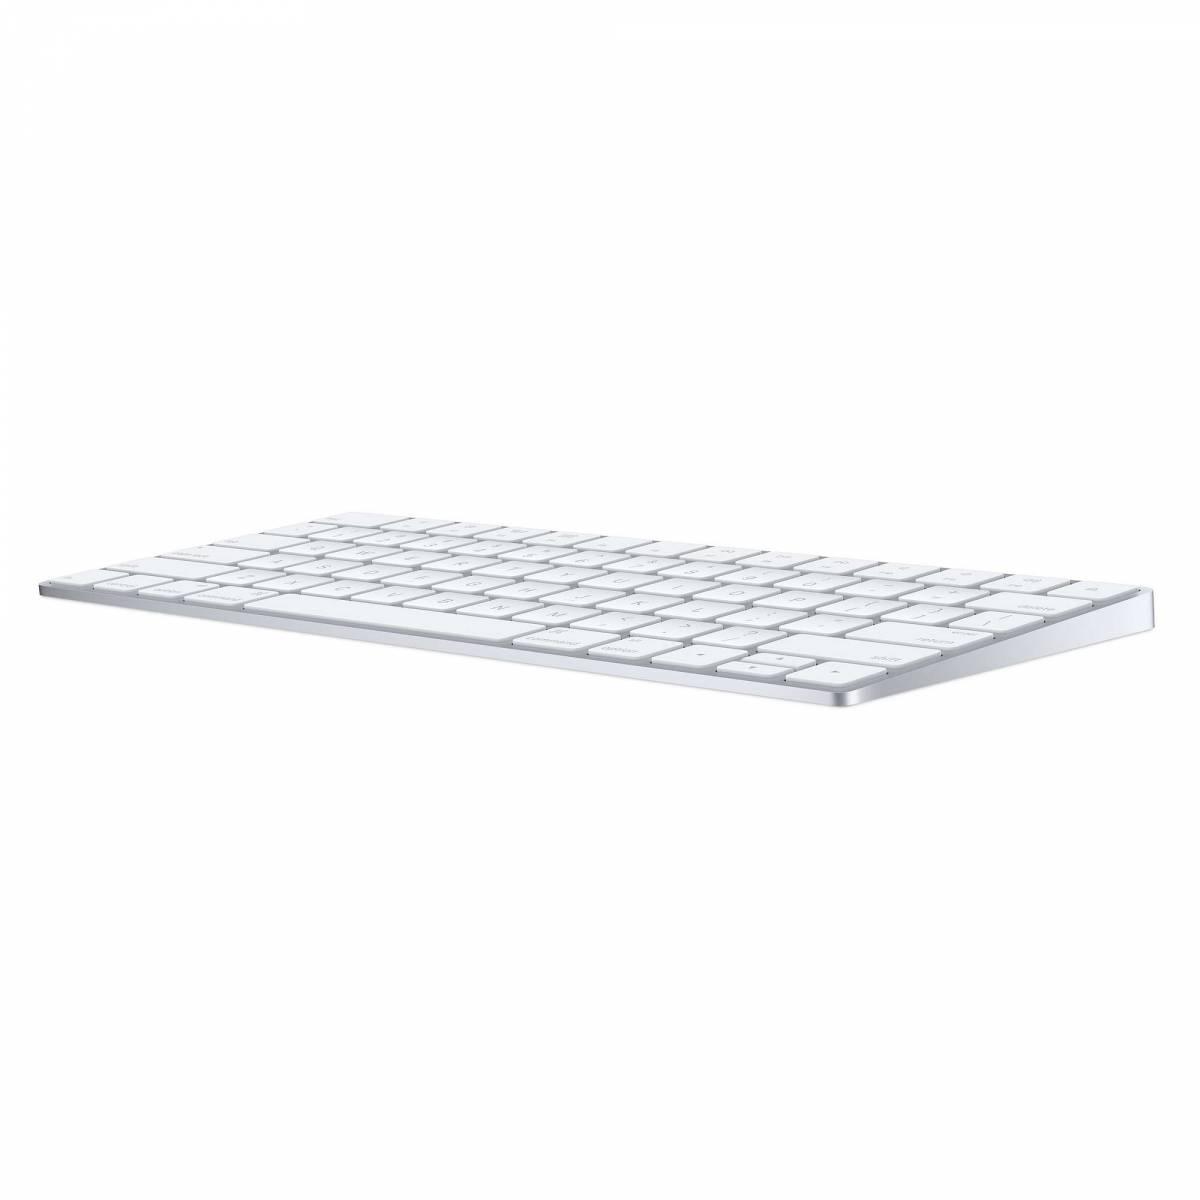 Eple Trolldommen tastatur Mackabler.no fra Apple   PÅ LAGER